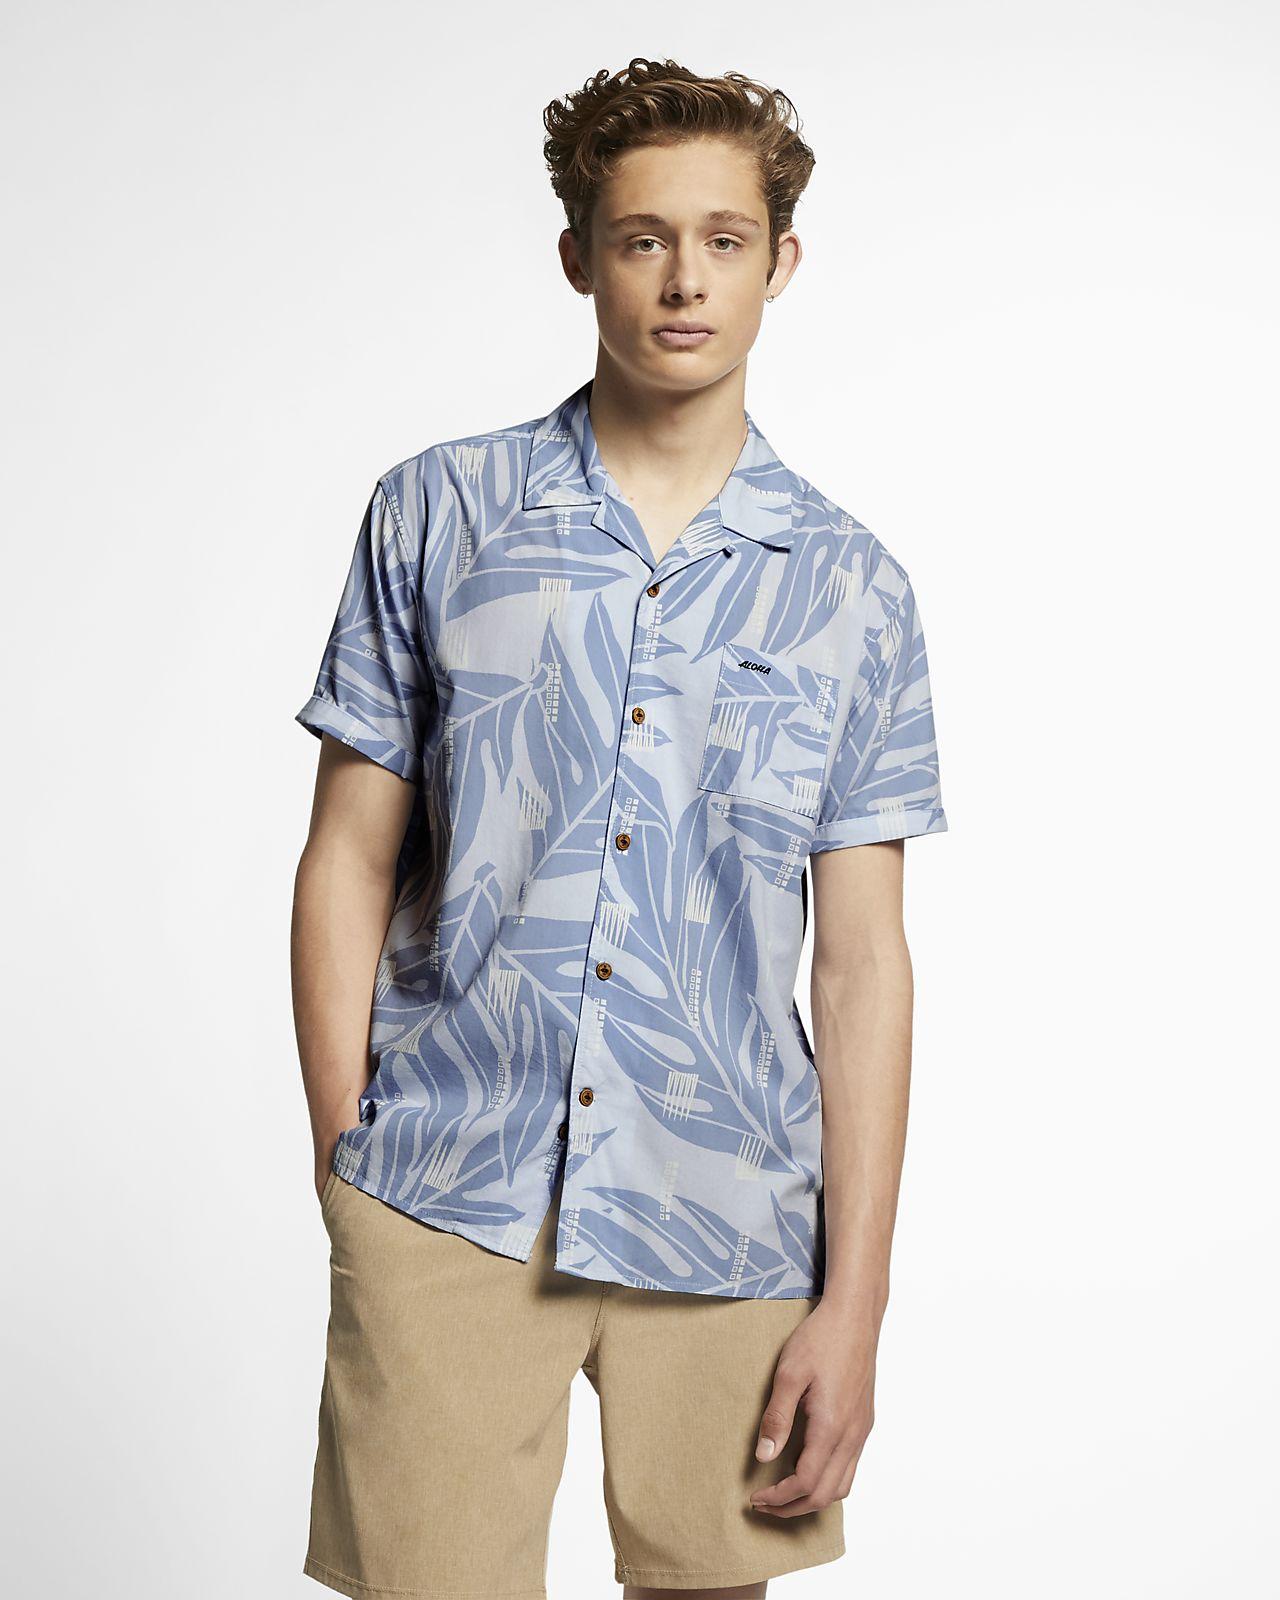 Kortärmad tröja Hurley Sig Zane Maloulu för män